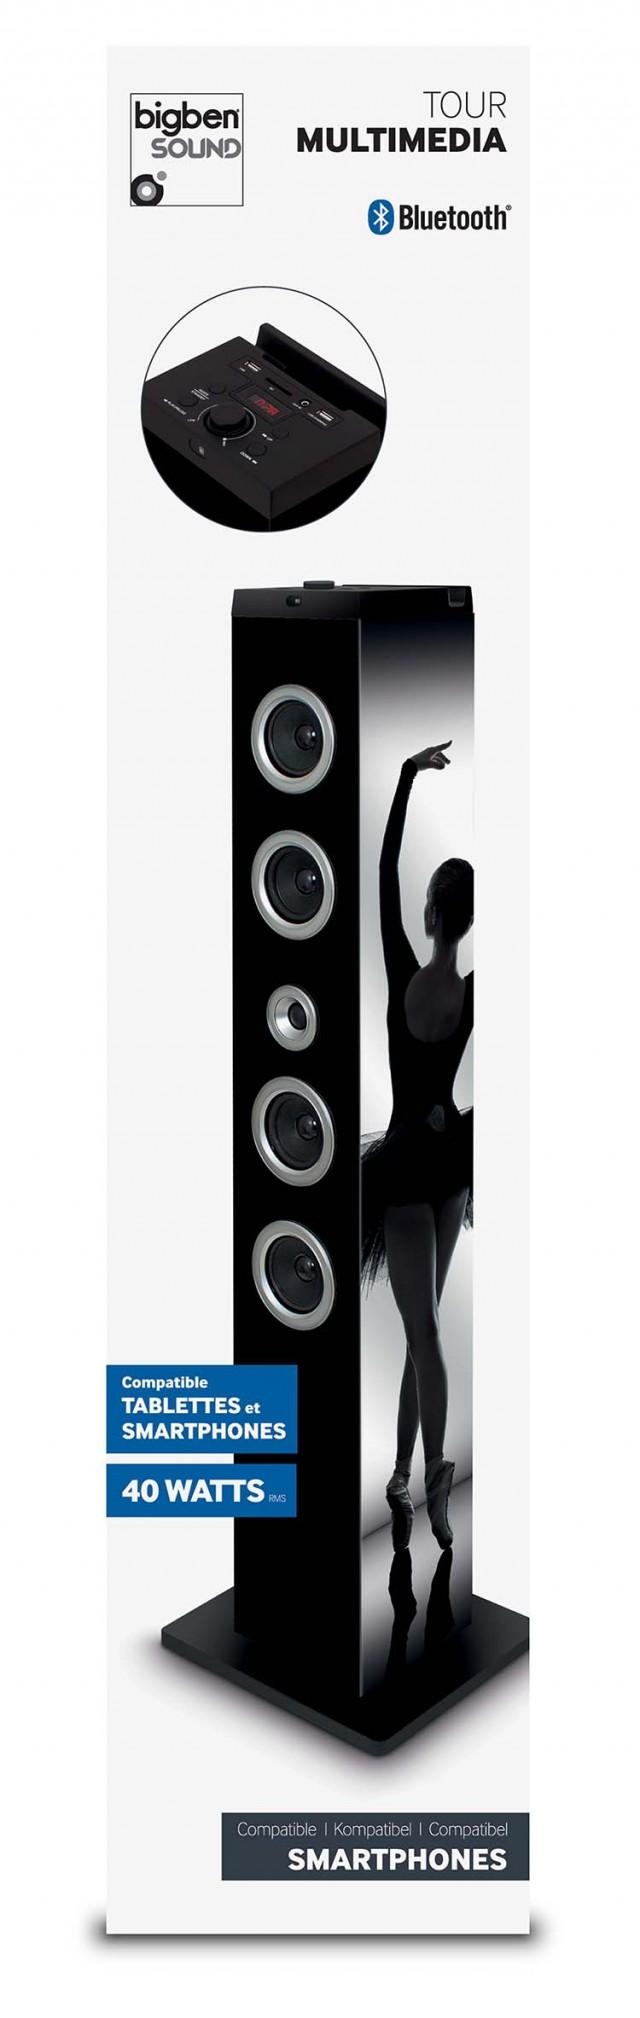 Multimedia Tower Ballerina – Immagine #1